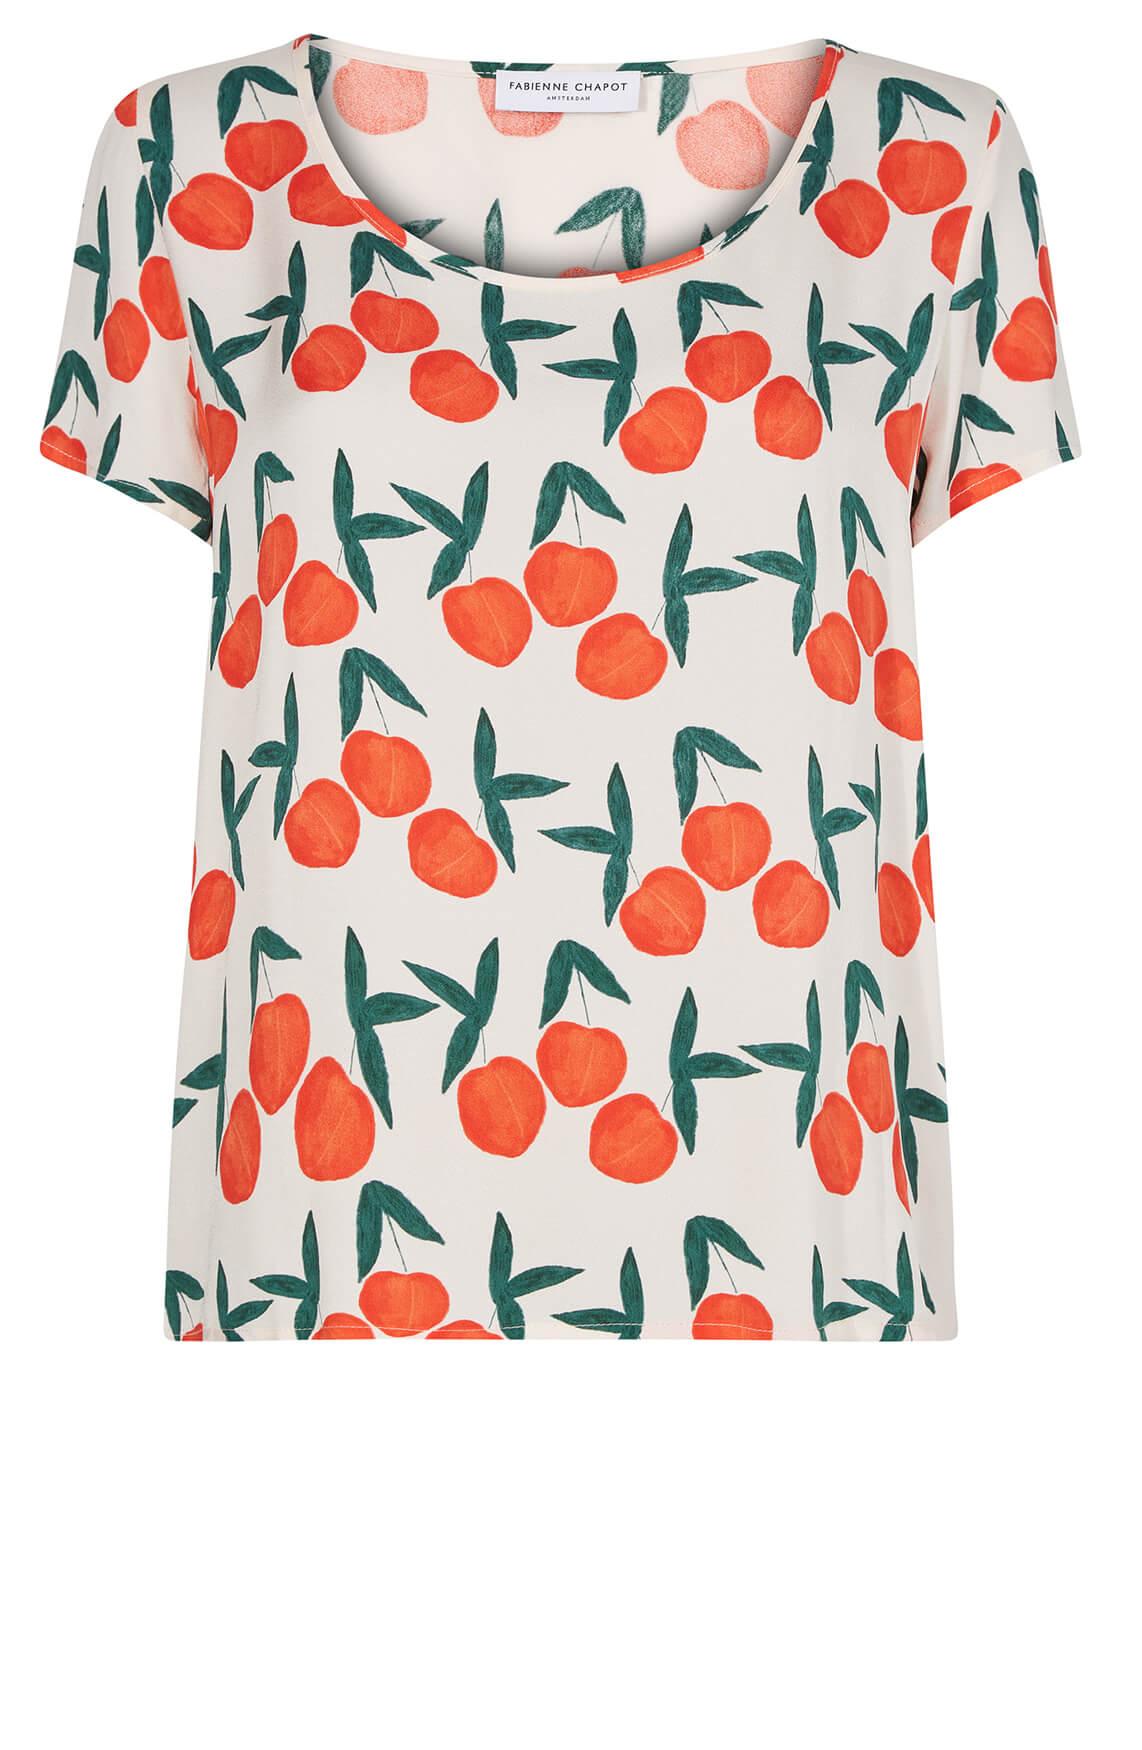 Fabienne Chapot Dames Doris shirt met perzikprint Oranje